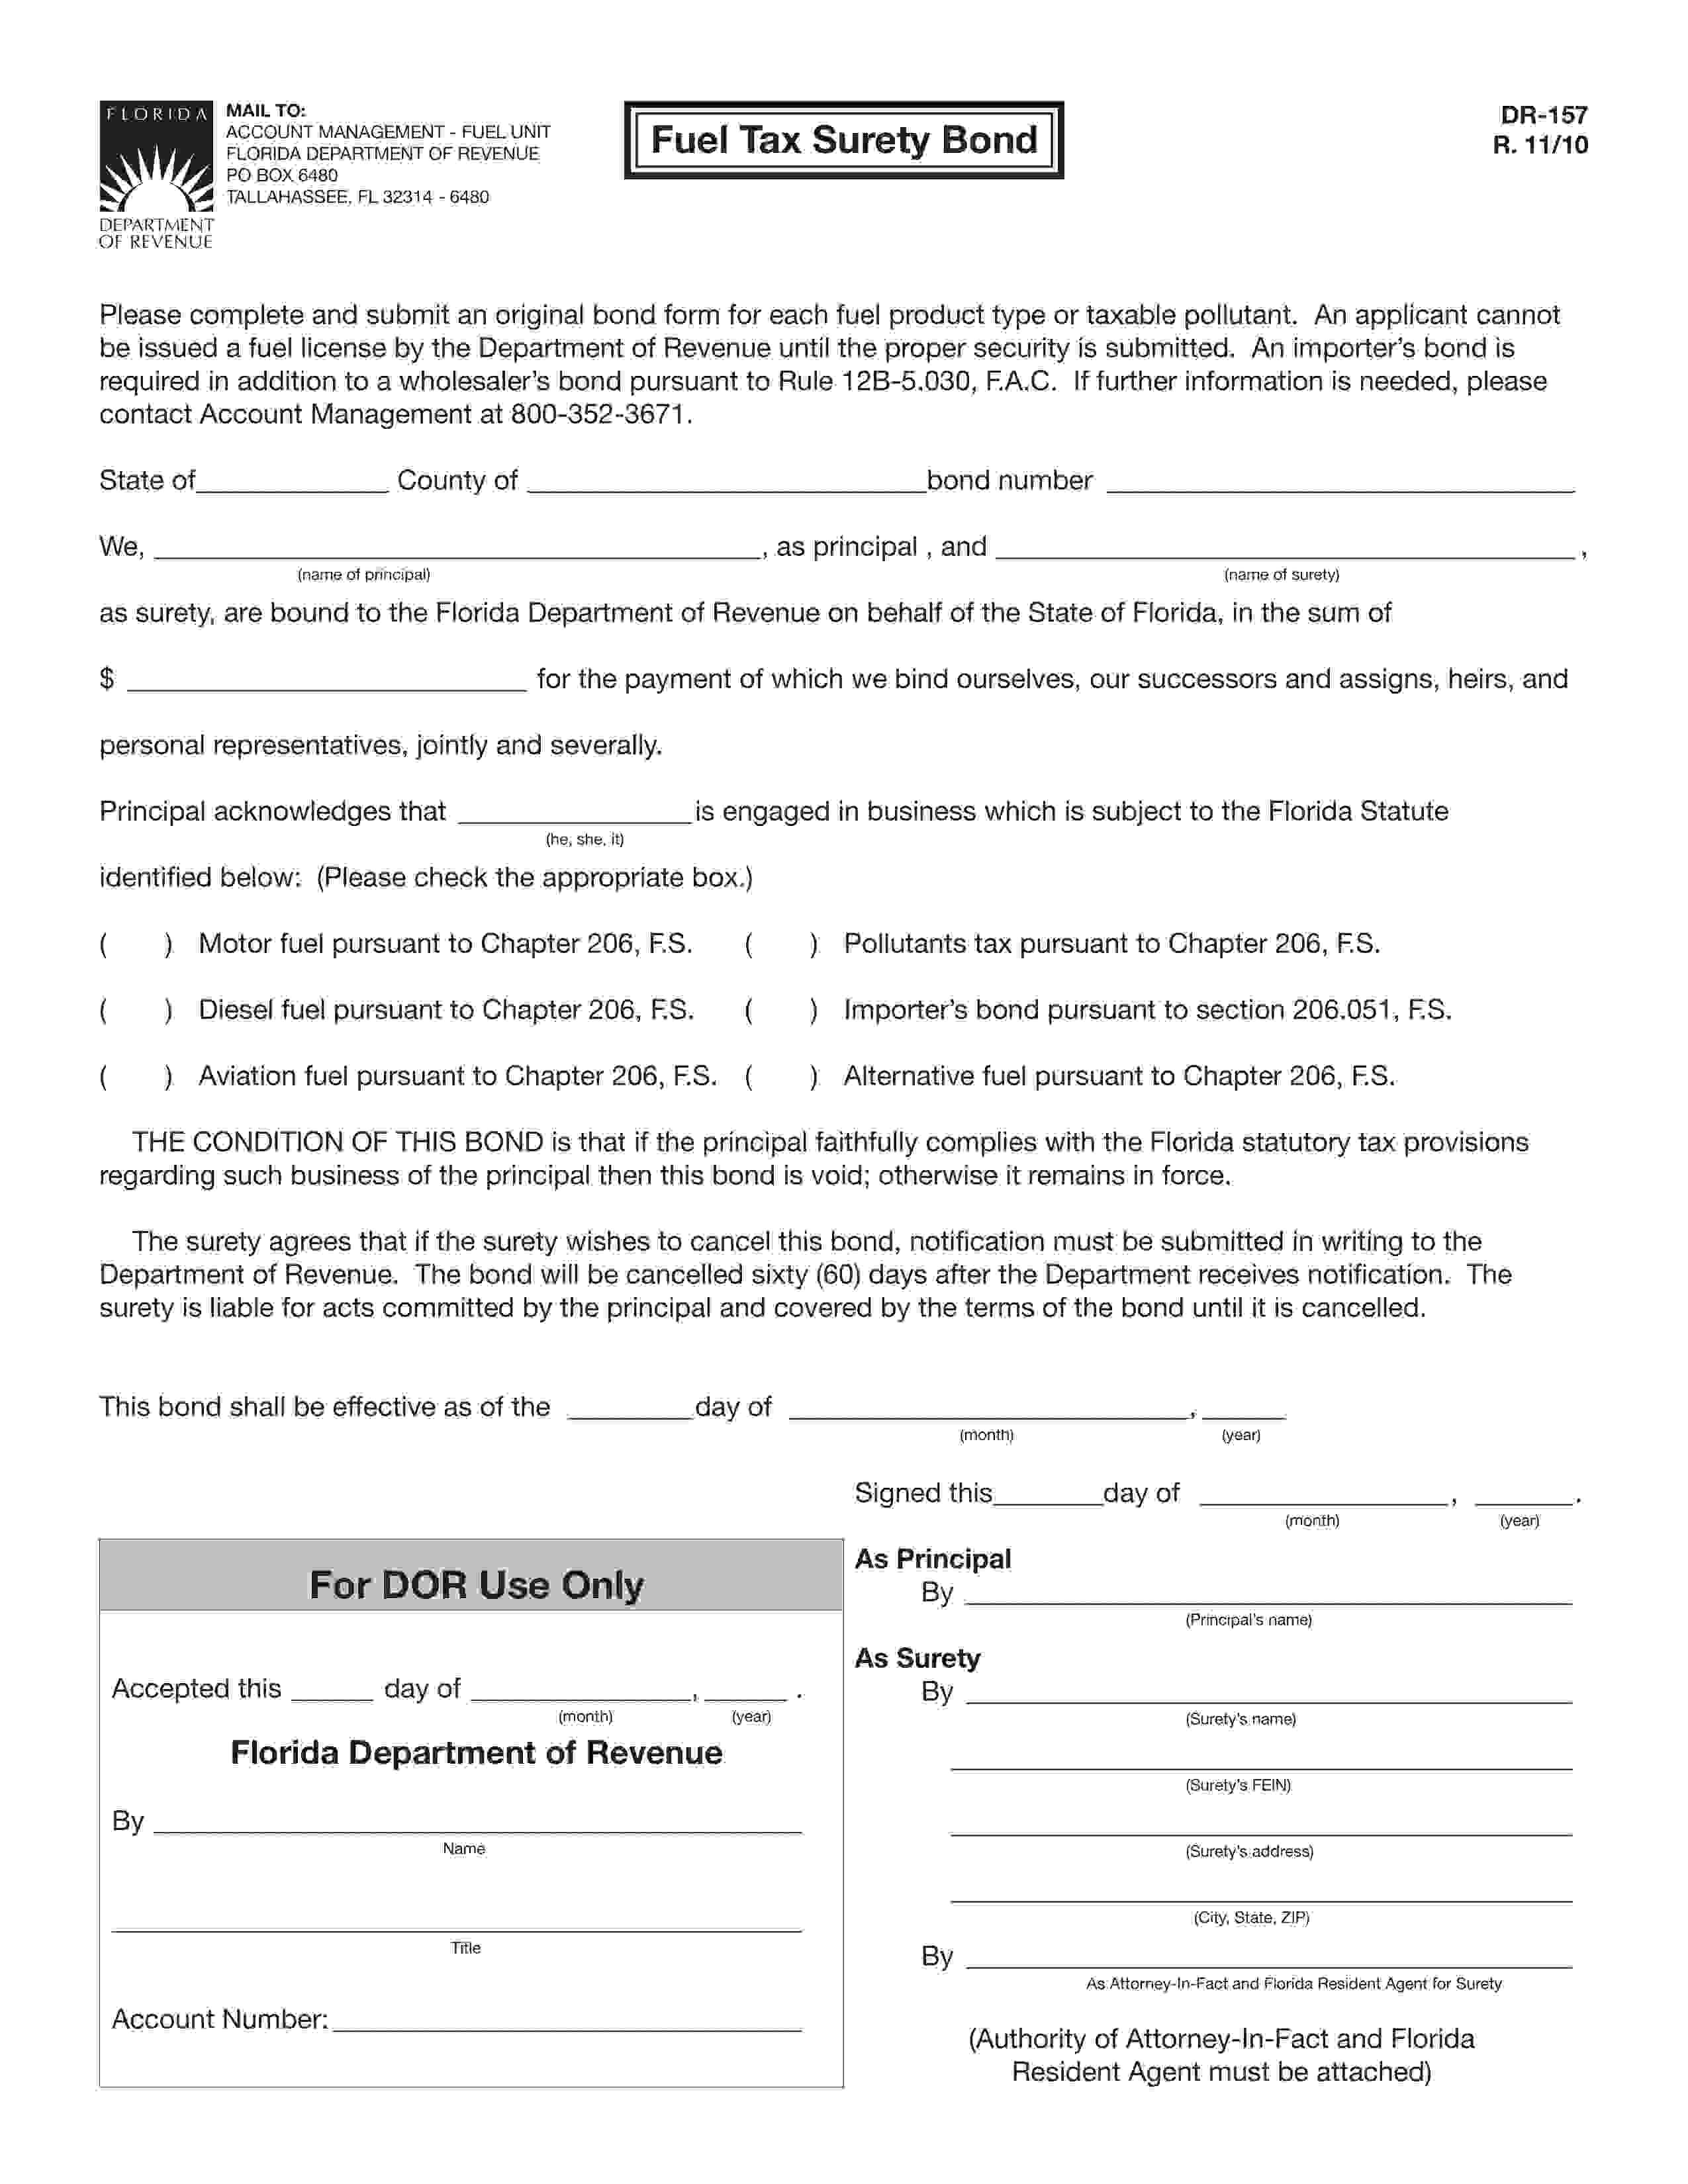 Florida Department Of Revenue, Fuel Unit Fuel Tax: Importers Bond sample image